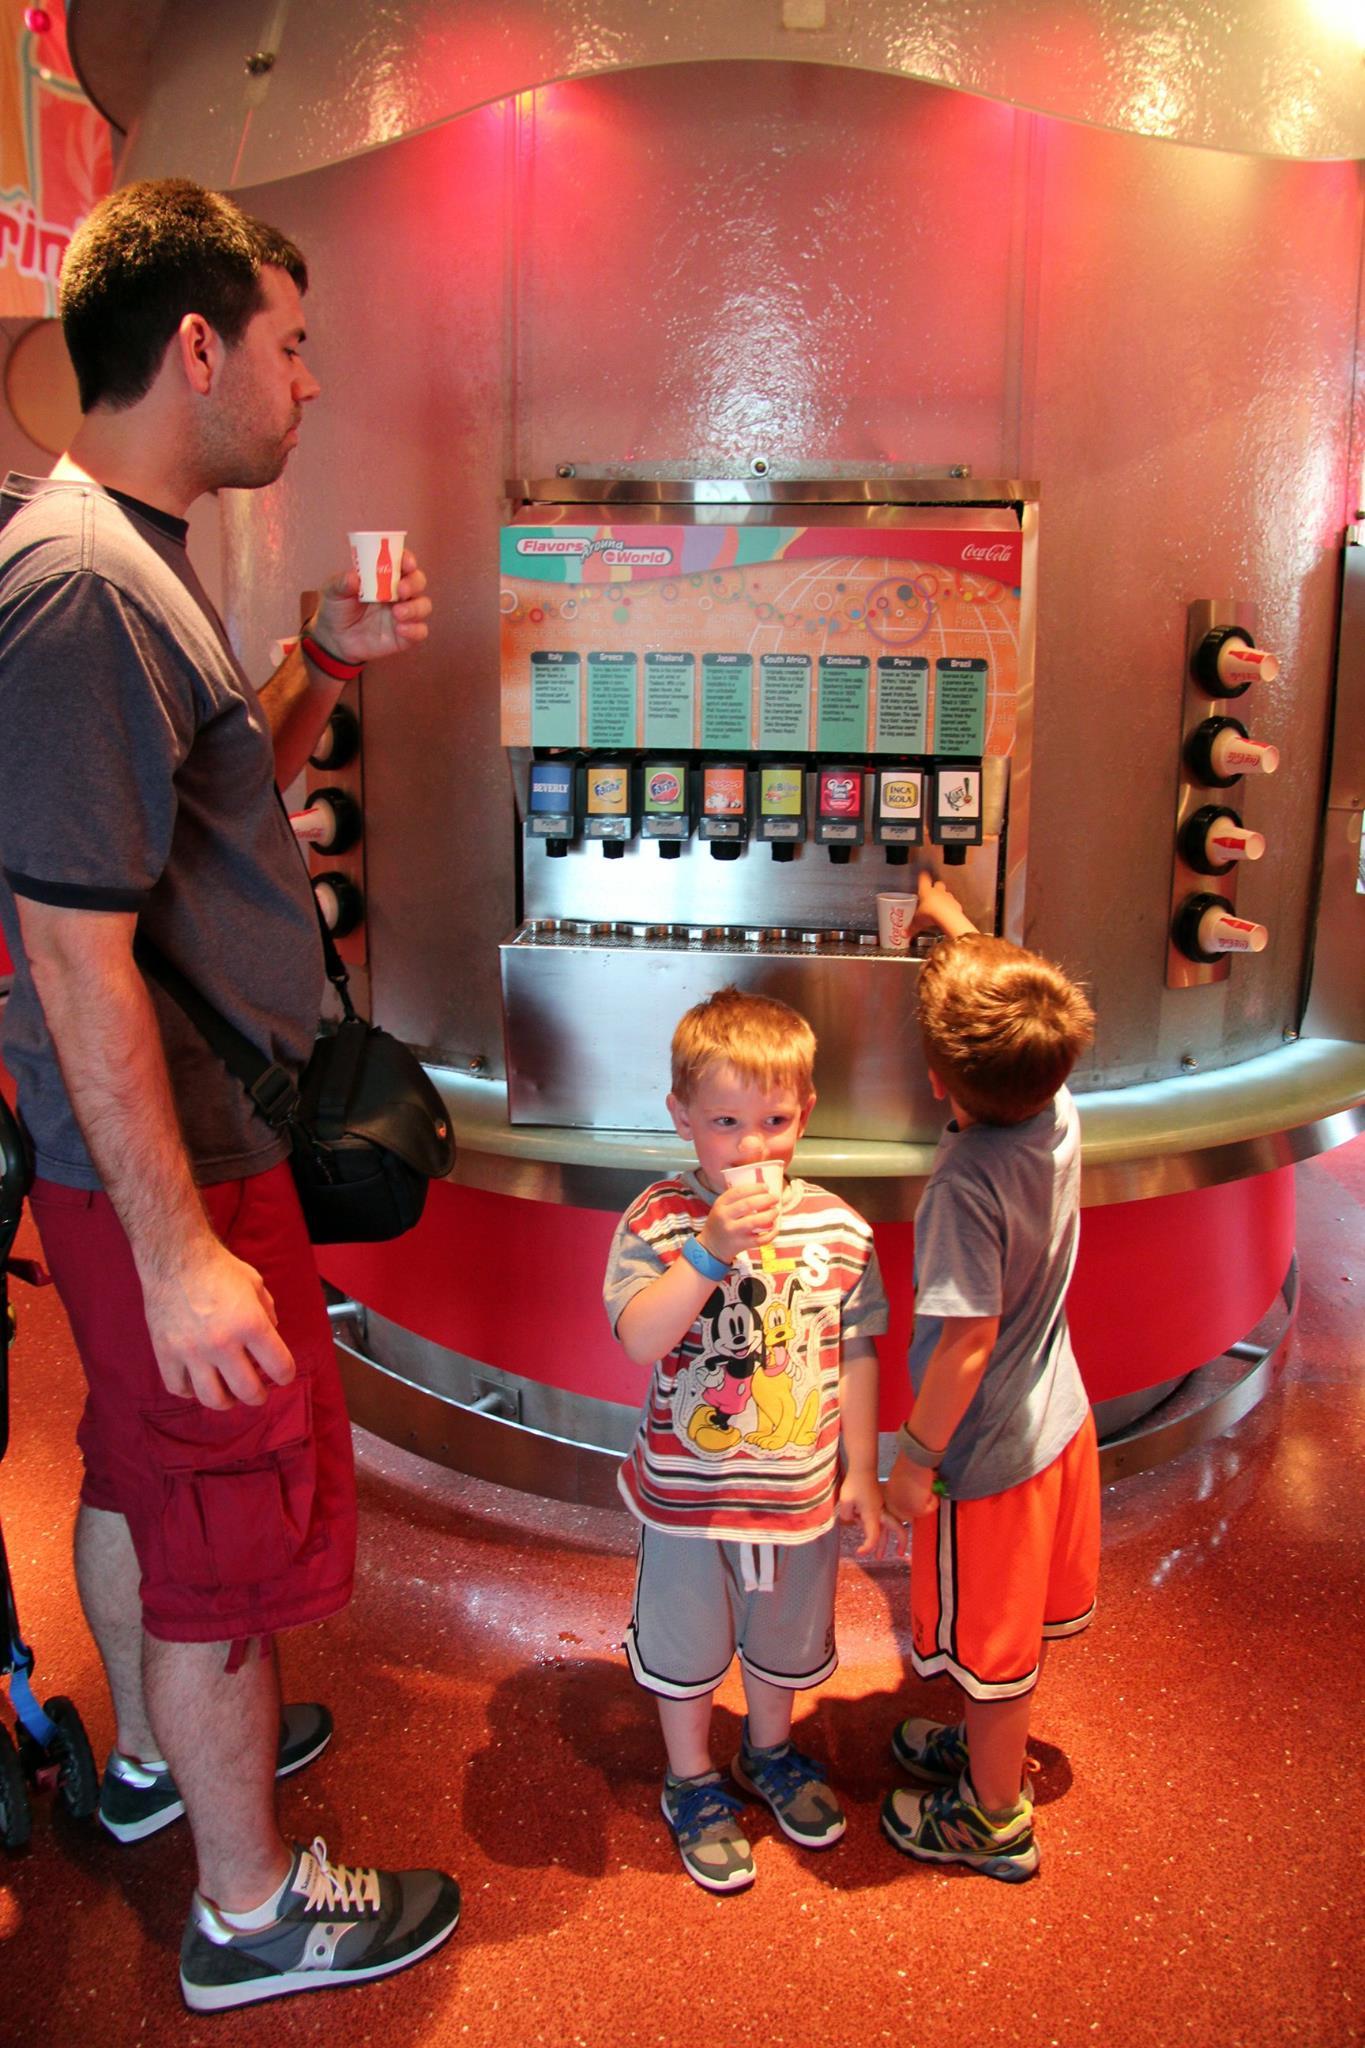 Disney with Little Ones: A Fun Freebie